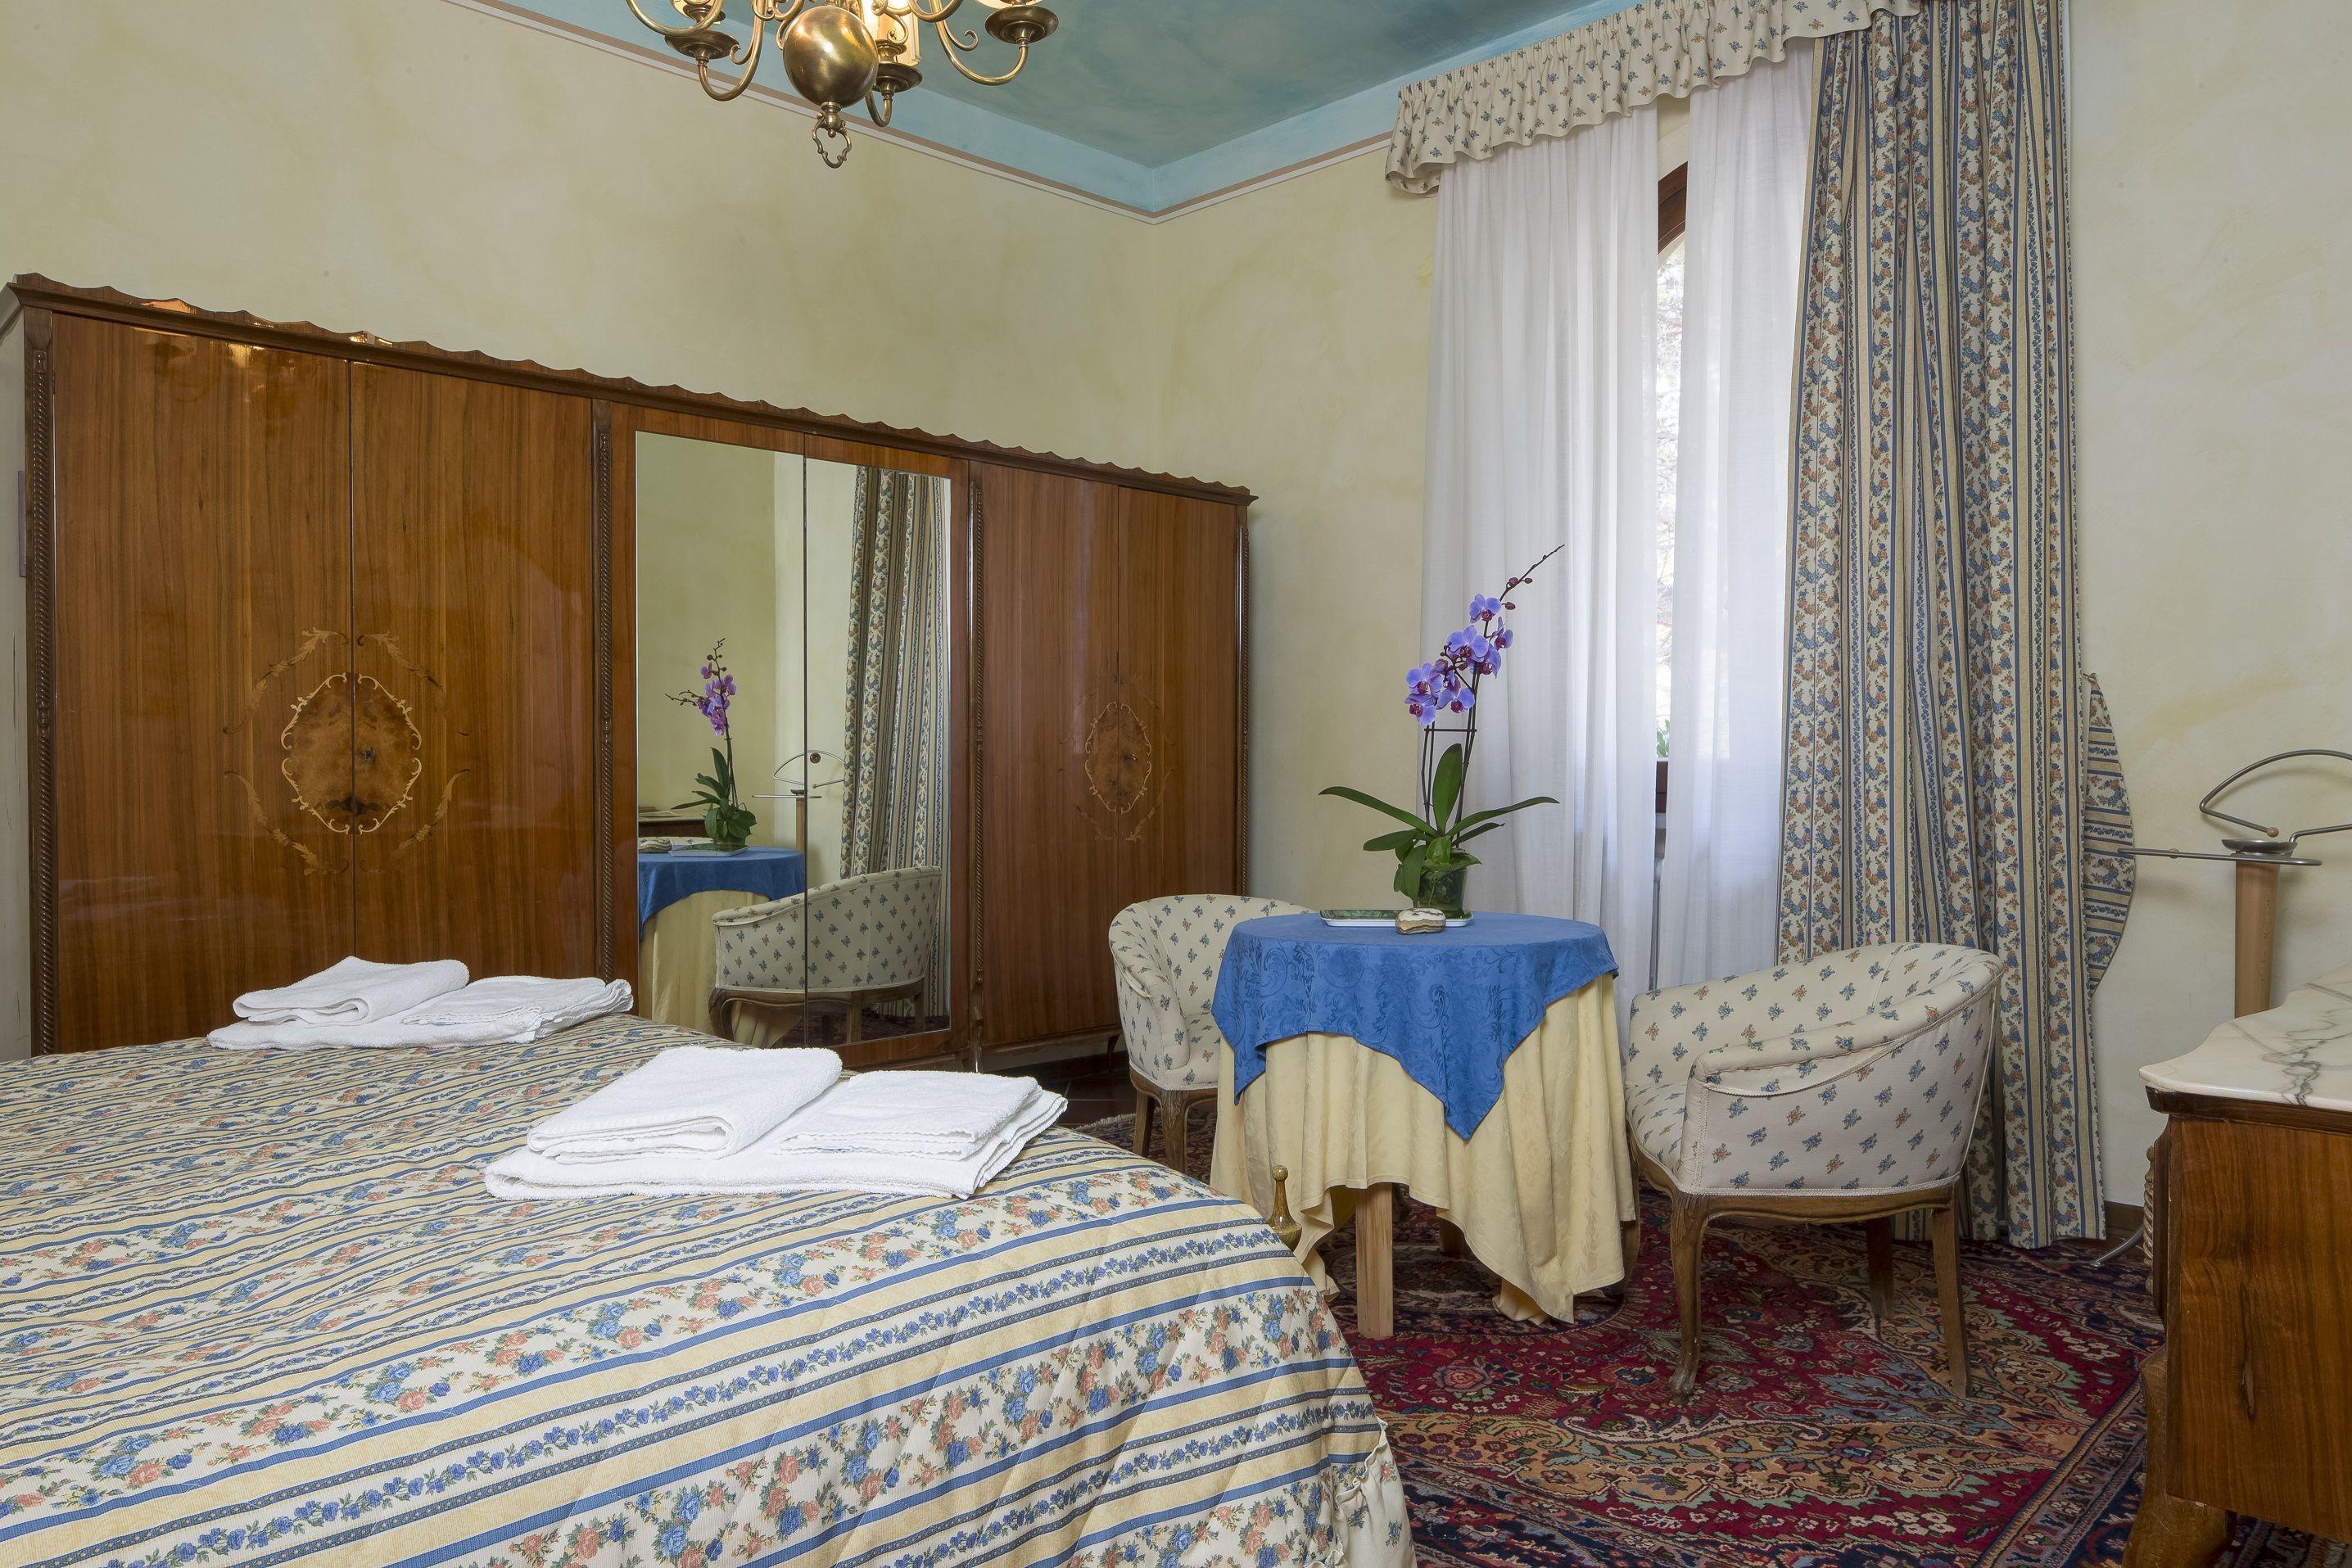 Apartment Bosco Lazzeroni Residence - Aida Holiday Home photo 19032197